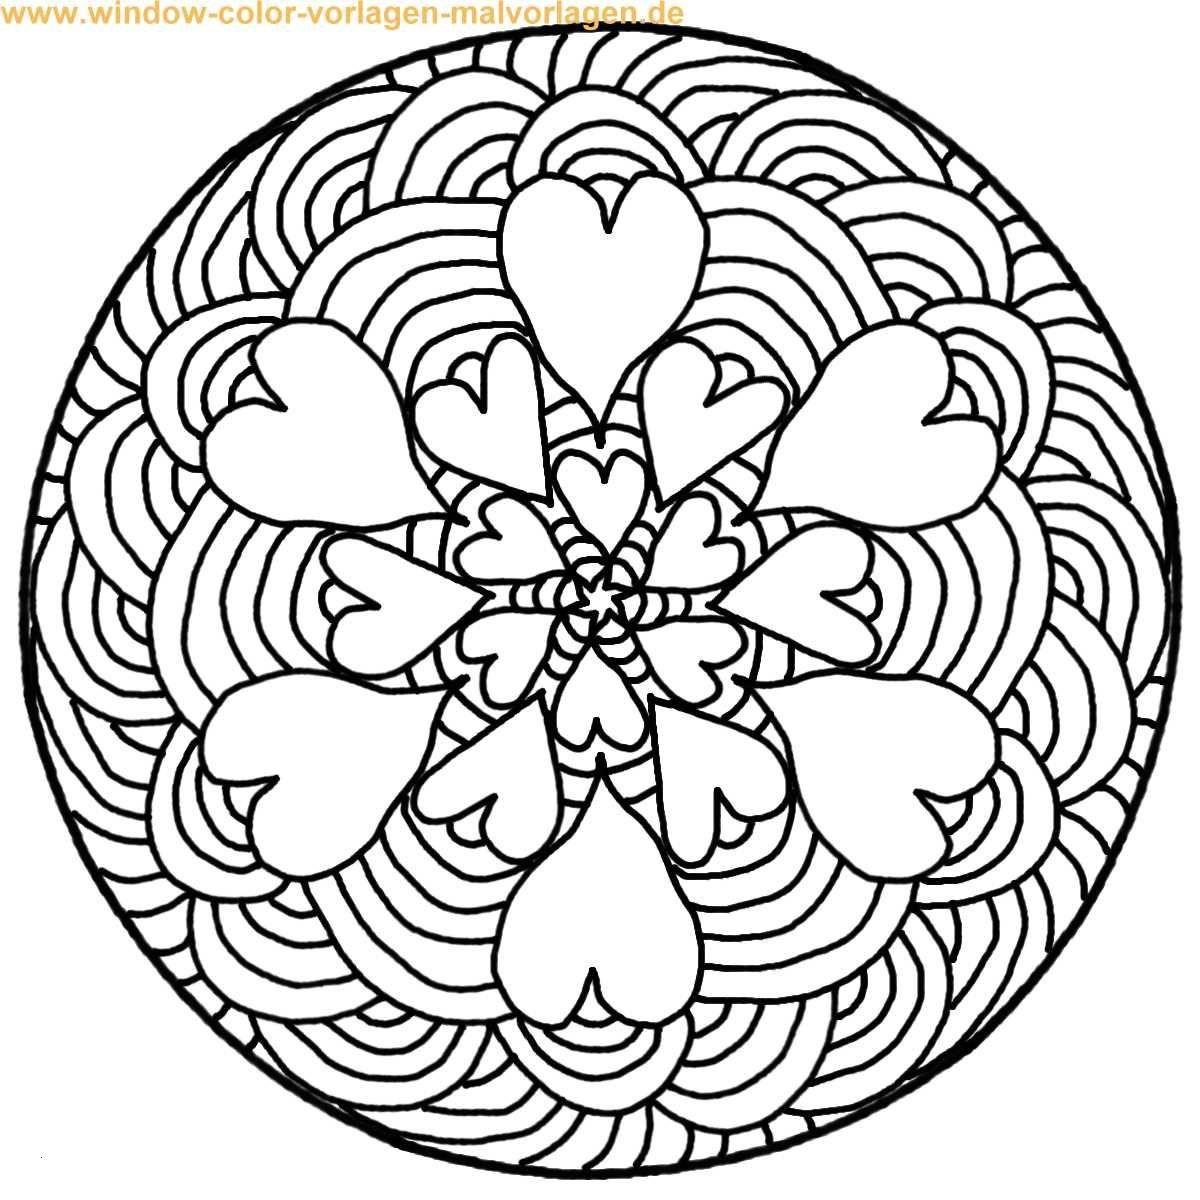 Ausmalbilder Mandala Herzen Einzigartig 40 Malvorlagen Mandala Scoredatscore Schön Ausmalbilder Mandala Sammlung